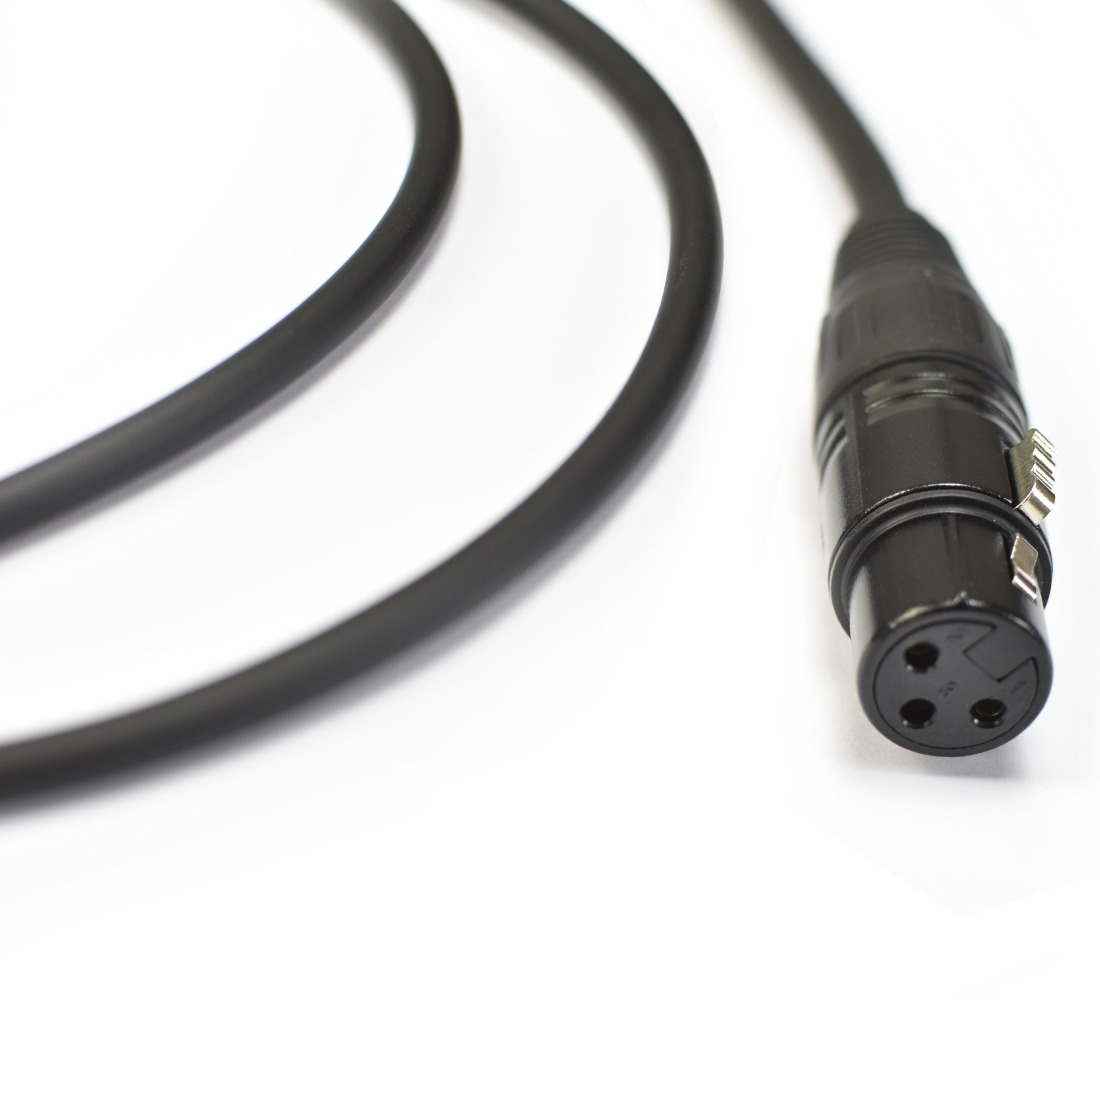 CABO DE MICROFONE 0,20MM CONECTORES XLRM X XLRF MOD NINJALW B 10FT/3.0